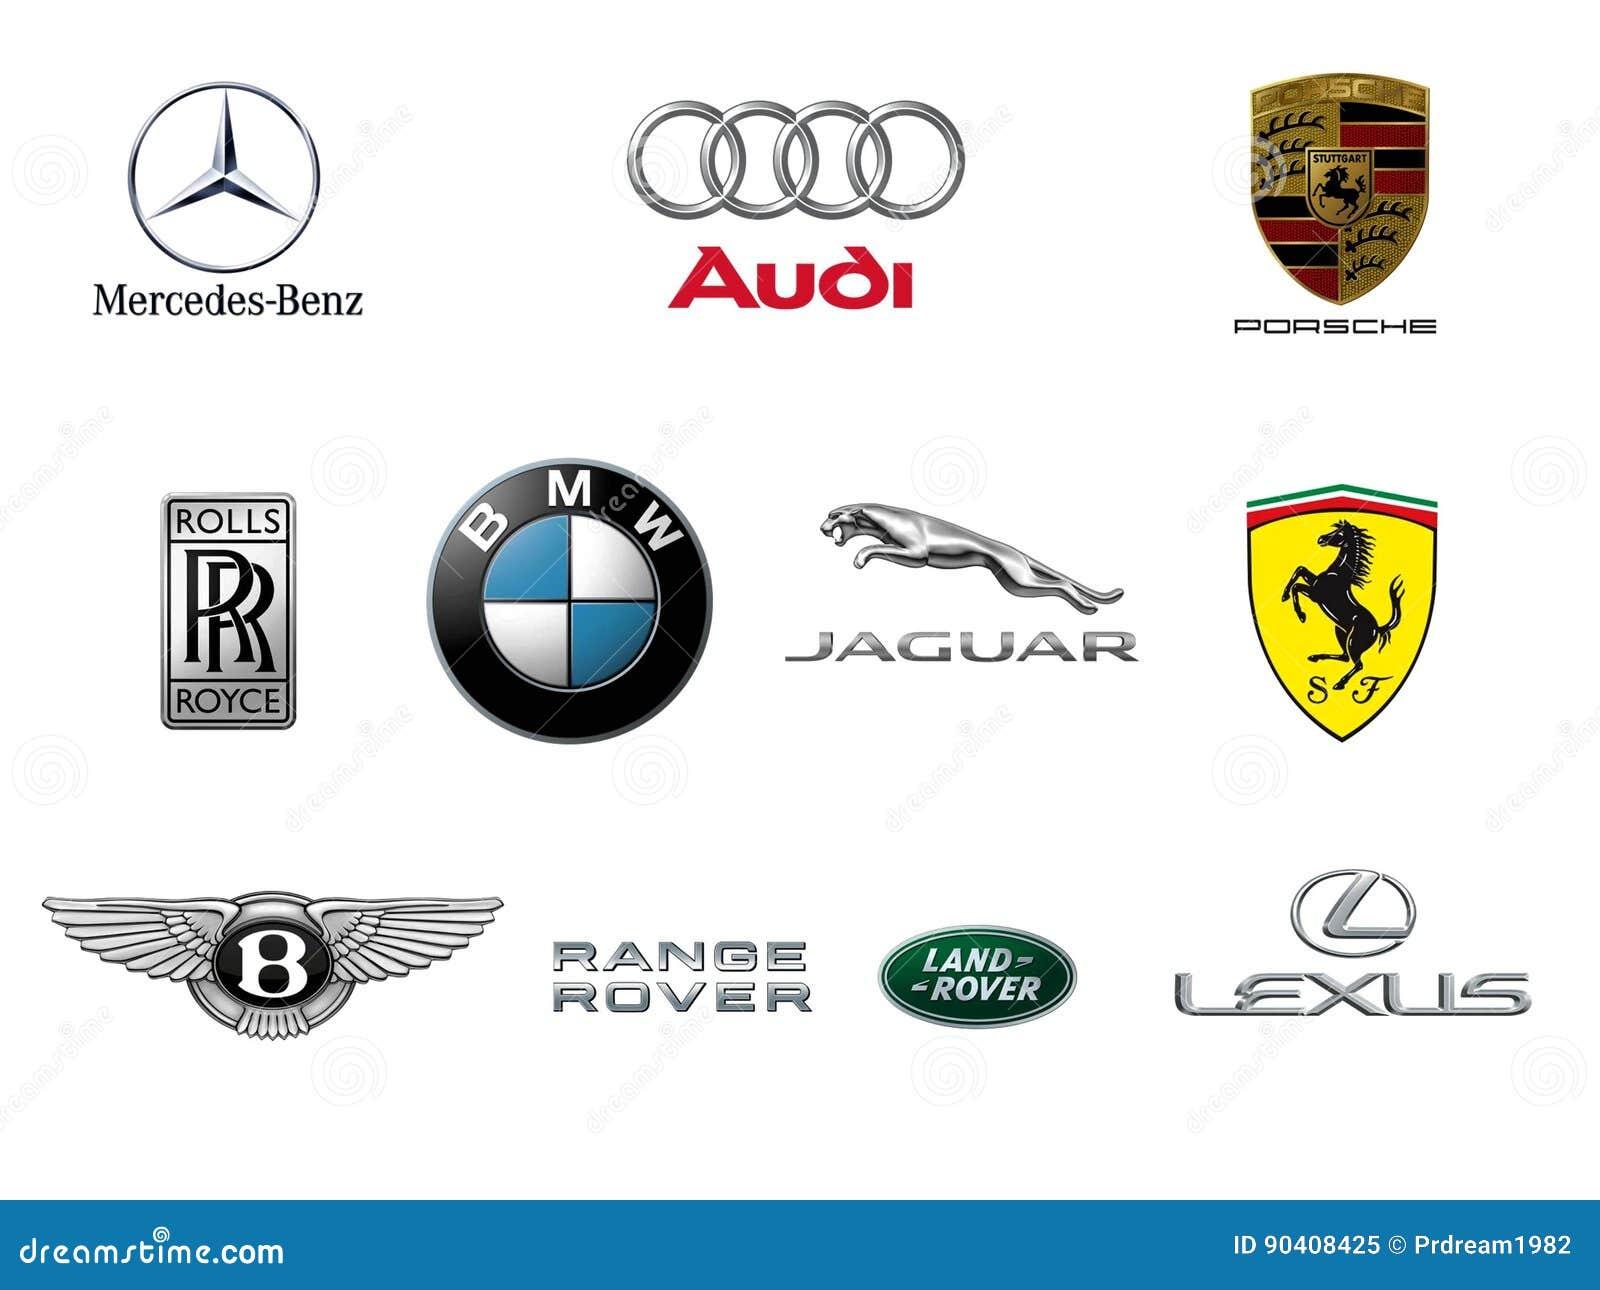 Luxury Vehicles Logo: Logos De Luxe De Marque De Voiture Image éditorial